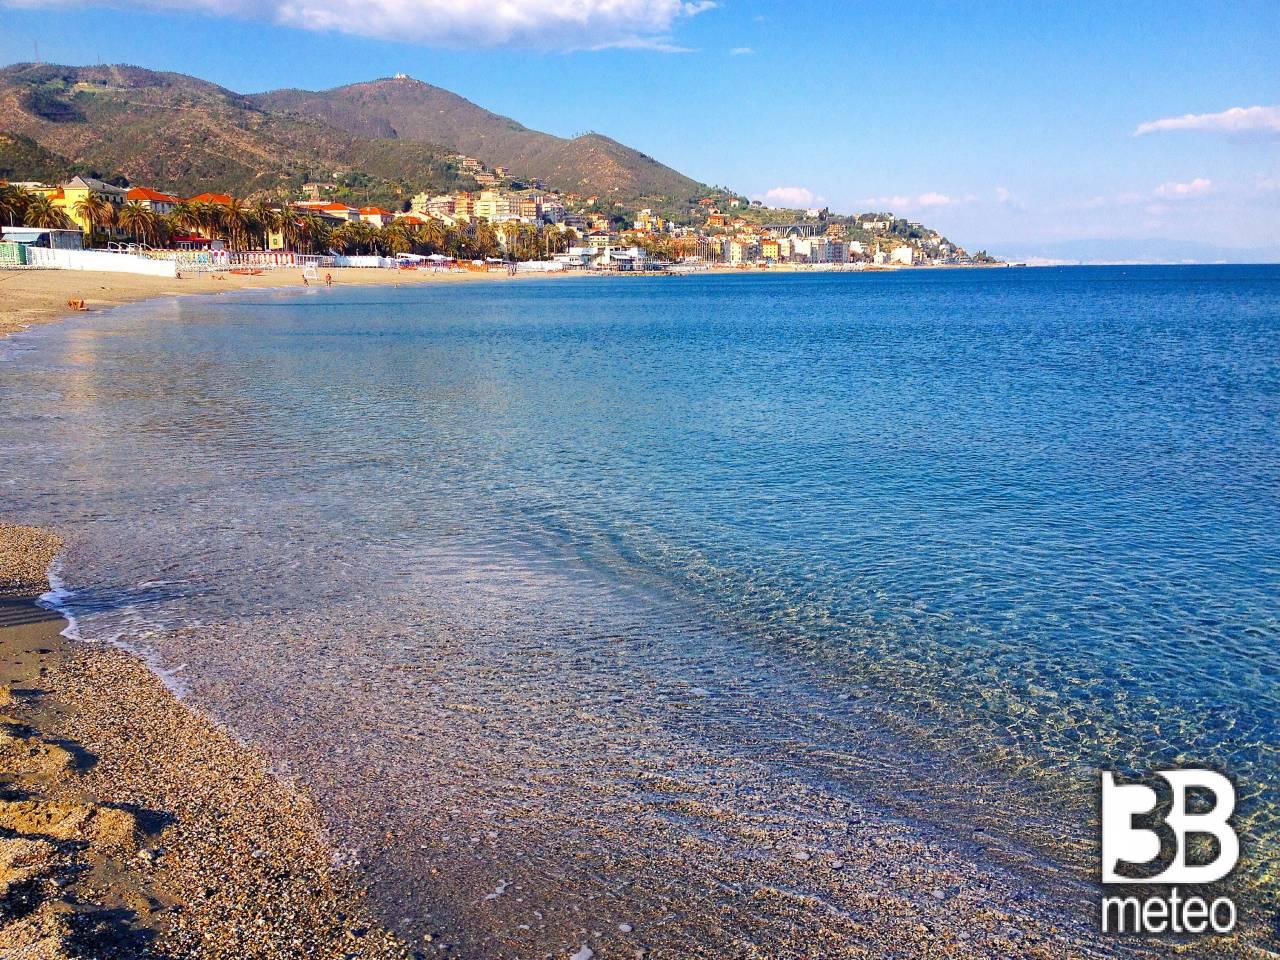 Spiaggia di varazze foto gallery 3b meteo - 3b meteo bagno di romagna ...